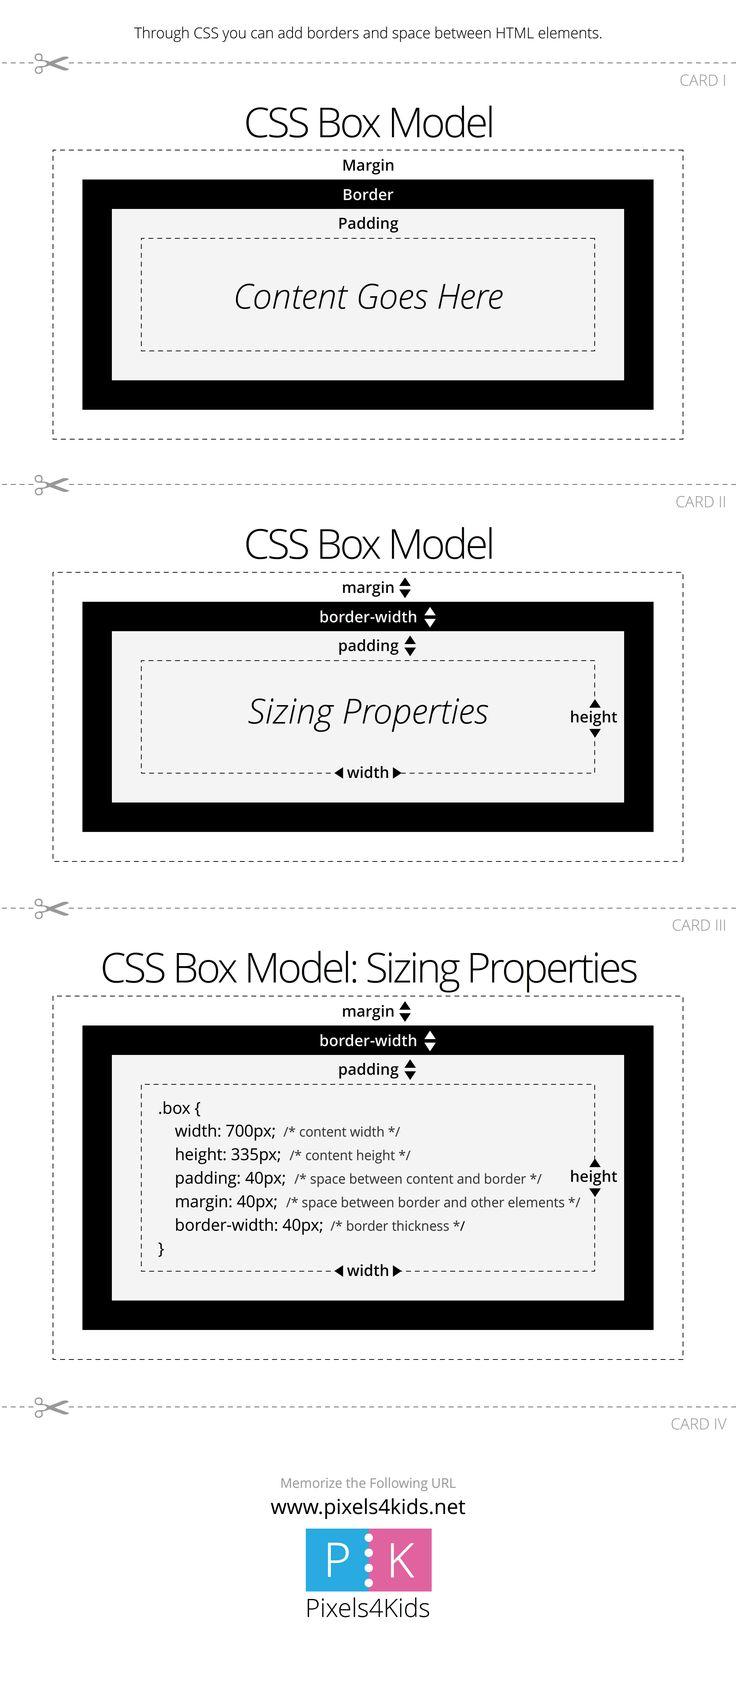 Pixels4Kids | Infographic | CSS Box Model